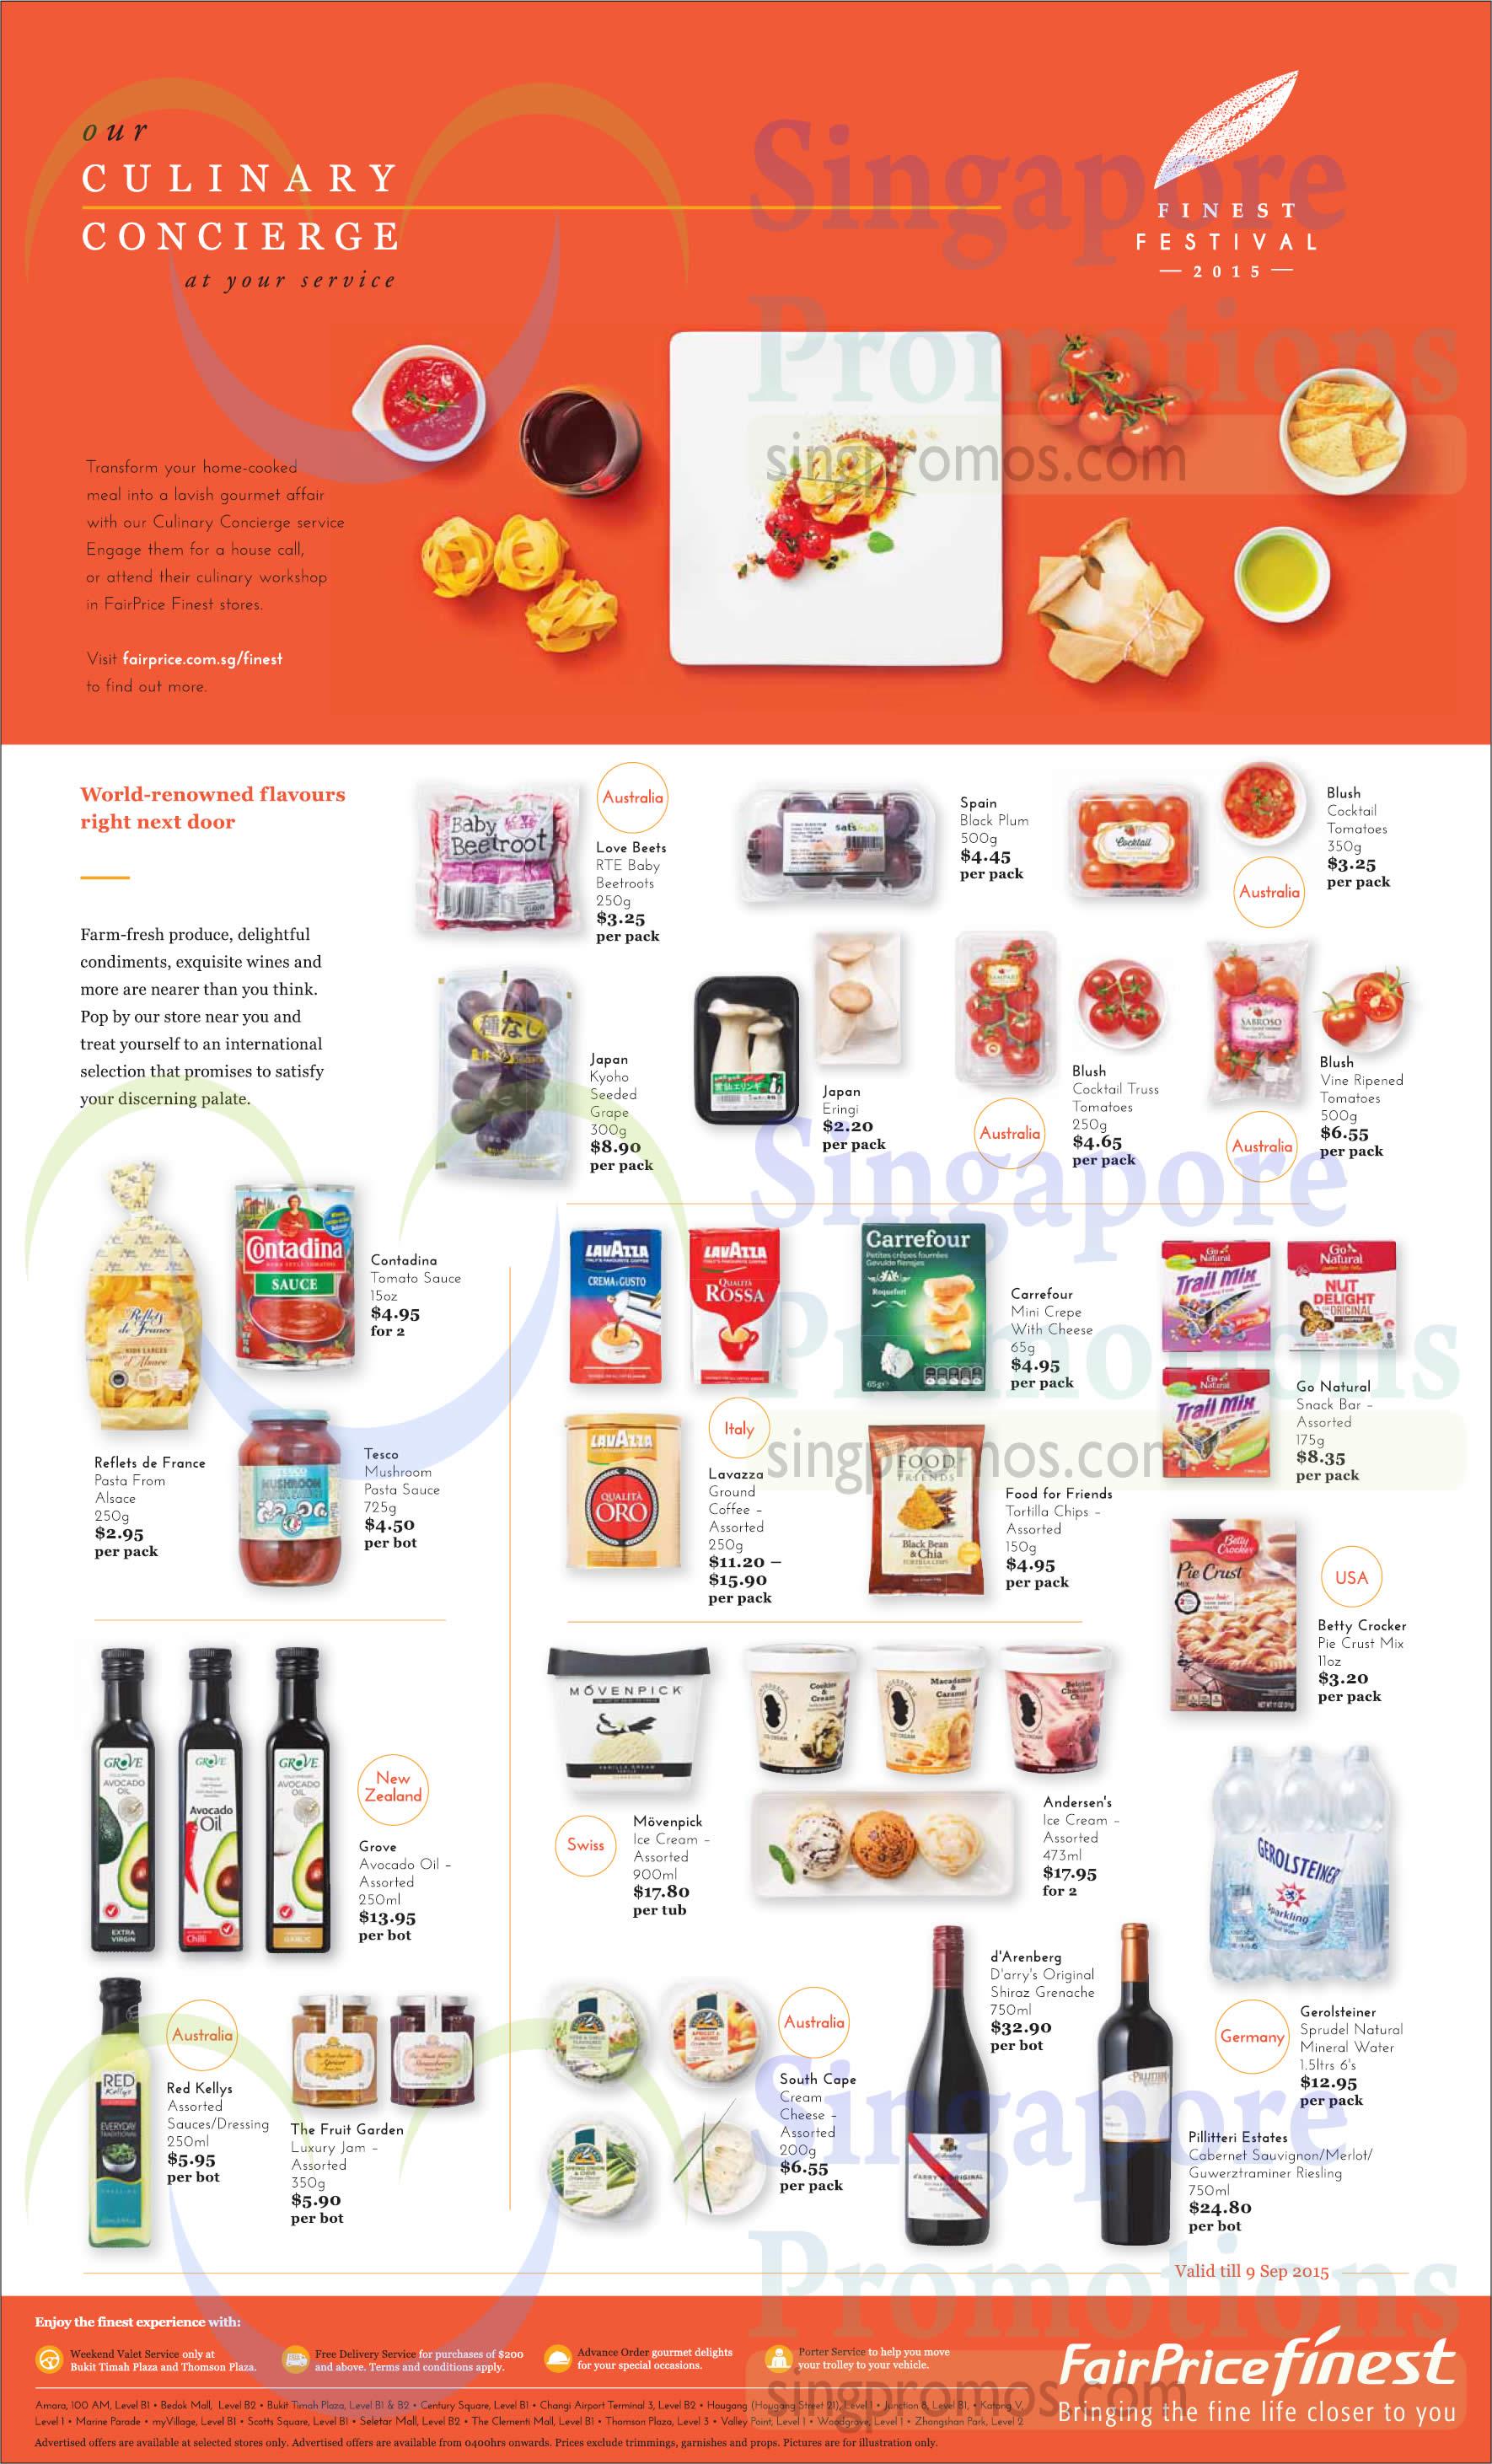 Groceries, wines, Ice Creams, Vegetables, Oils